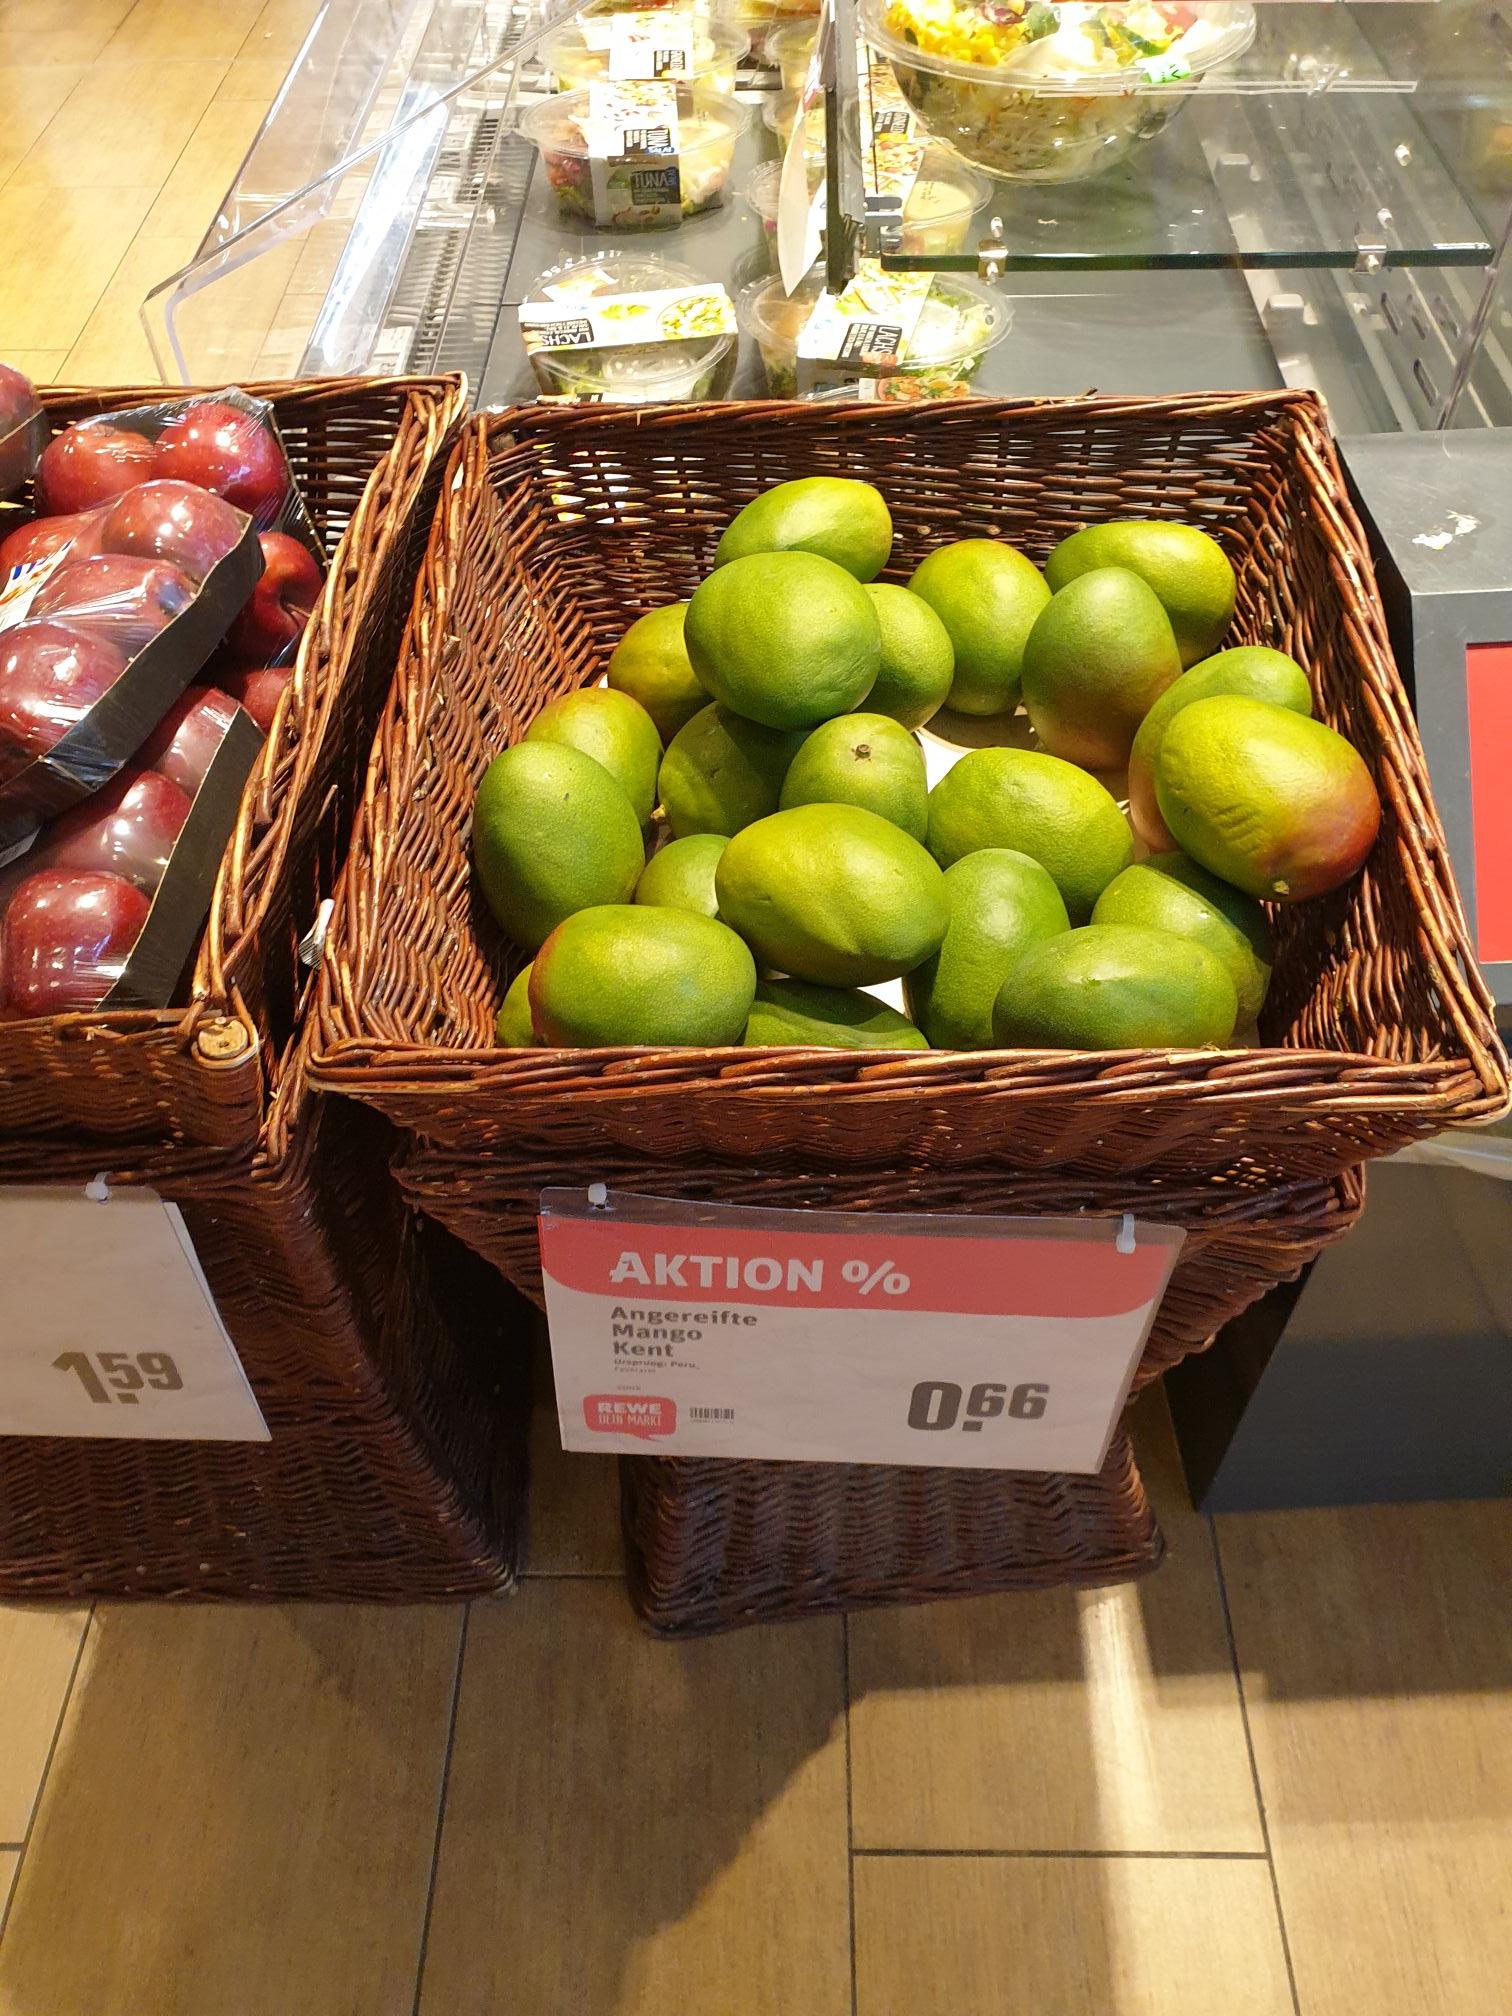 Mangos bei Rewe, 0,66€ [Bundesweit]